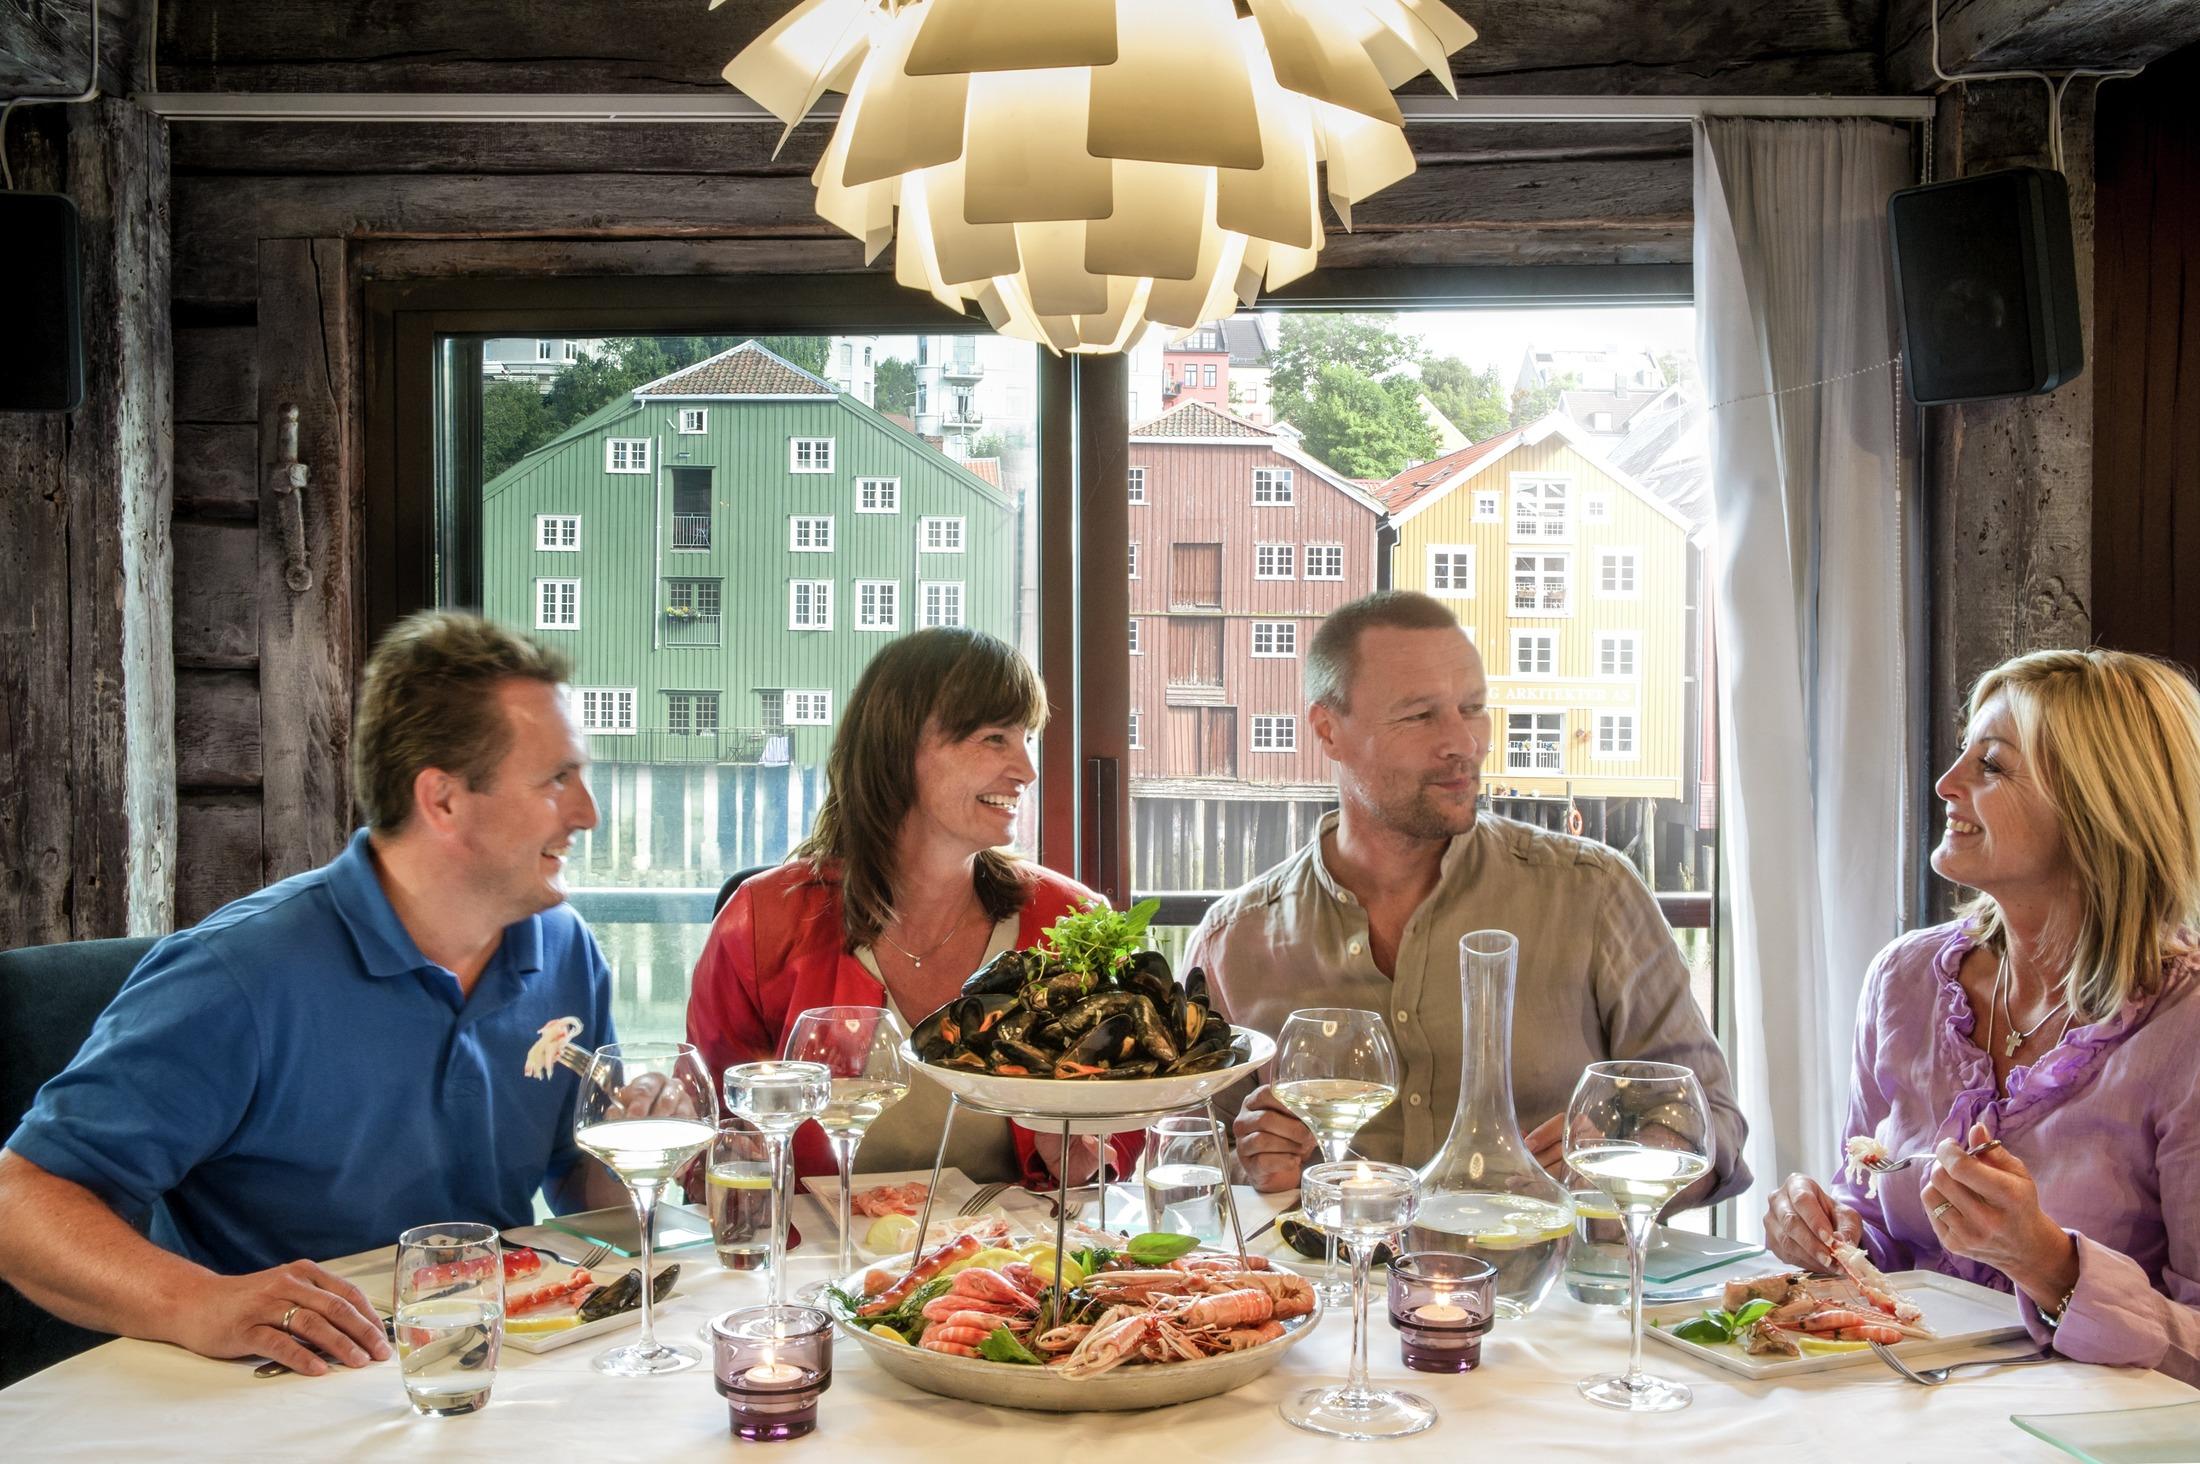 Havfruen fiske og sjømatrestaurant i Trondheim, Trøndelag. Foto: CH - Visitnorway.com